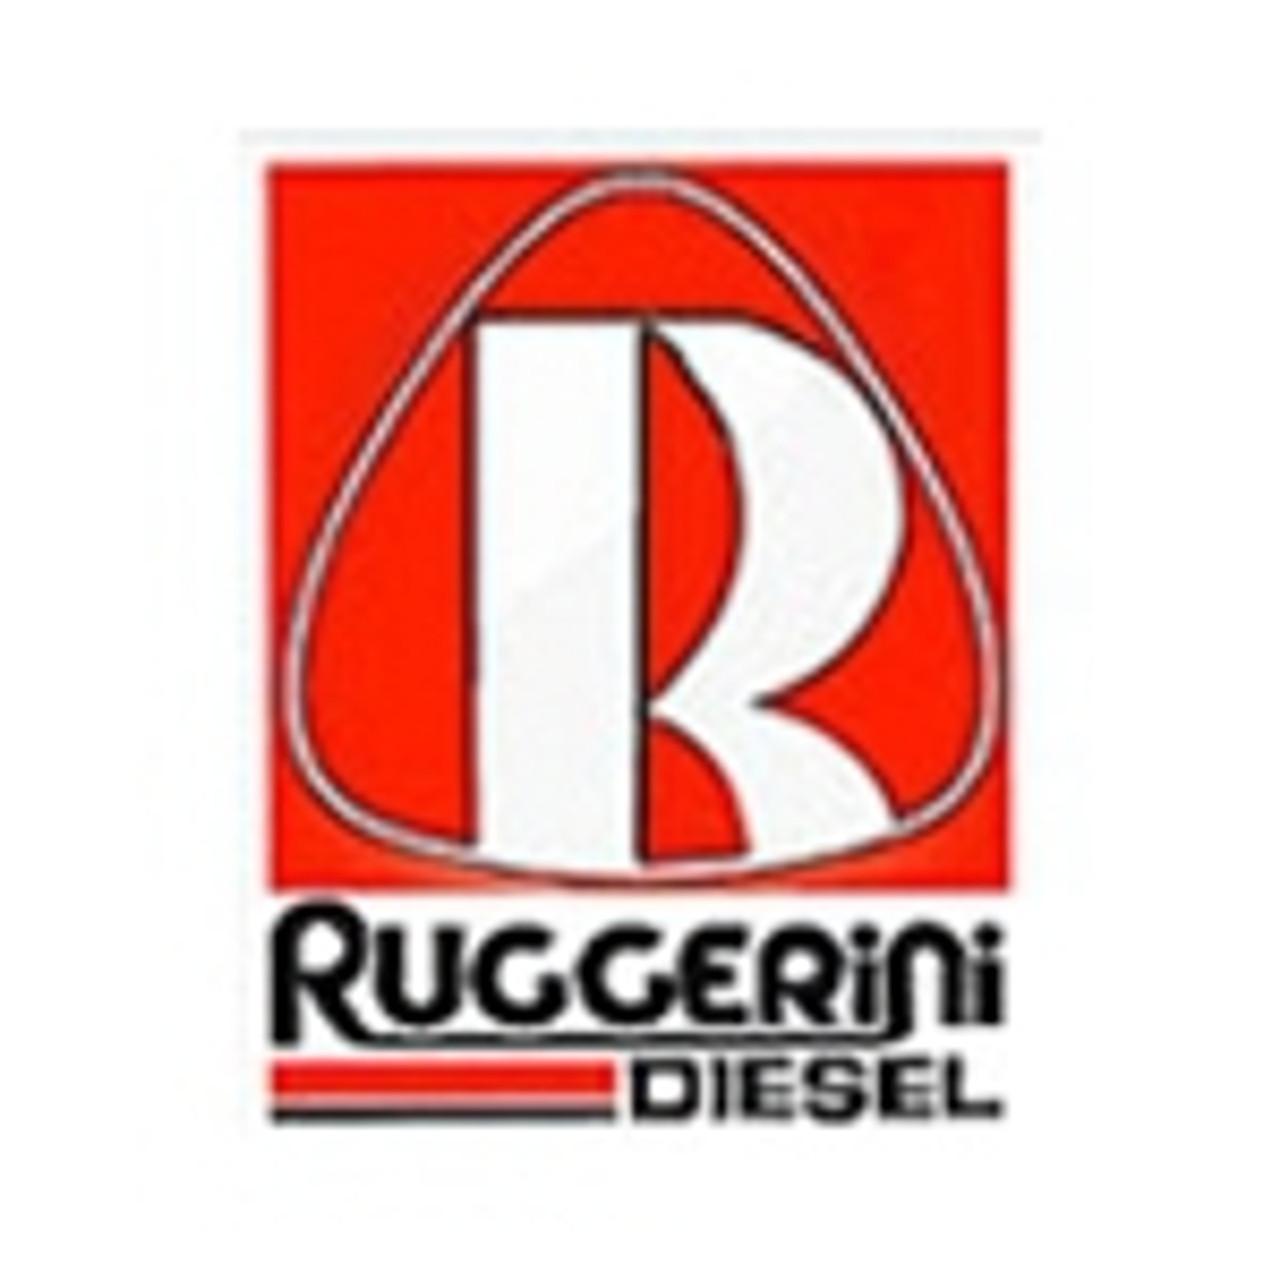 Ruggerini Marine